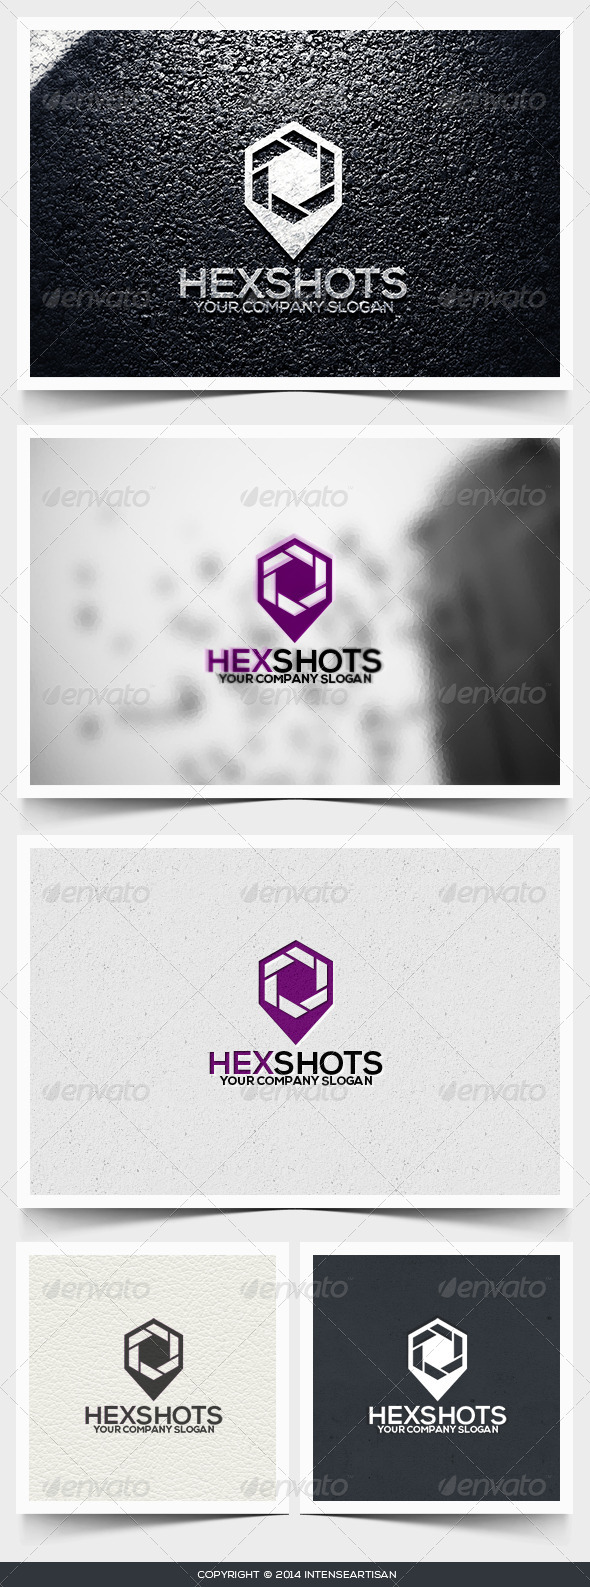 Hexshots Logo Template - Objects Logo Templates